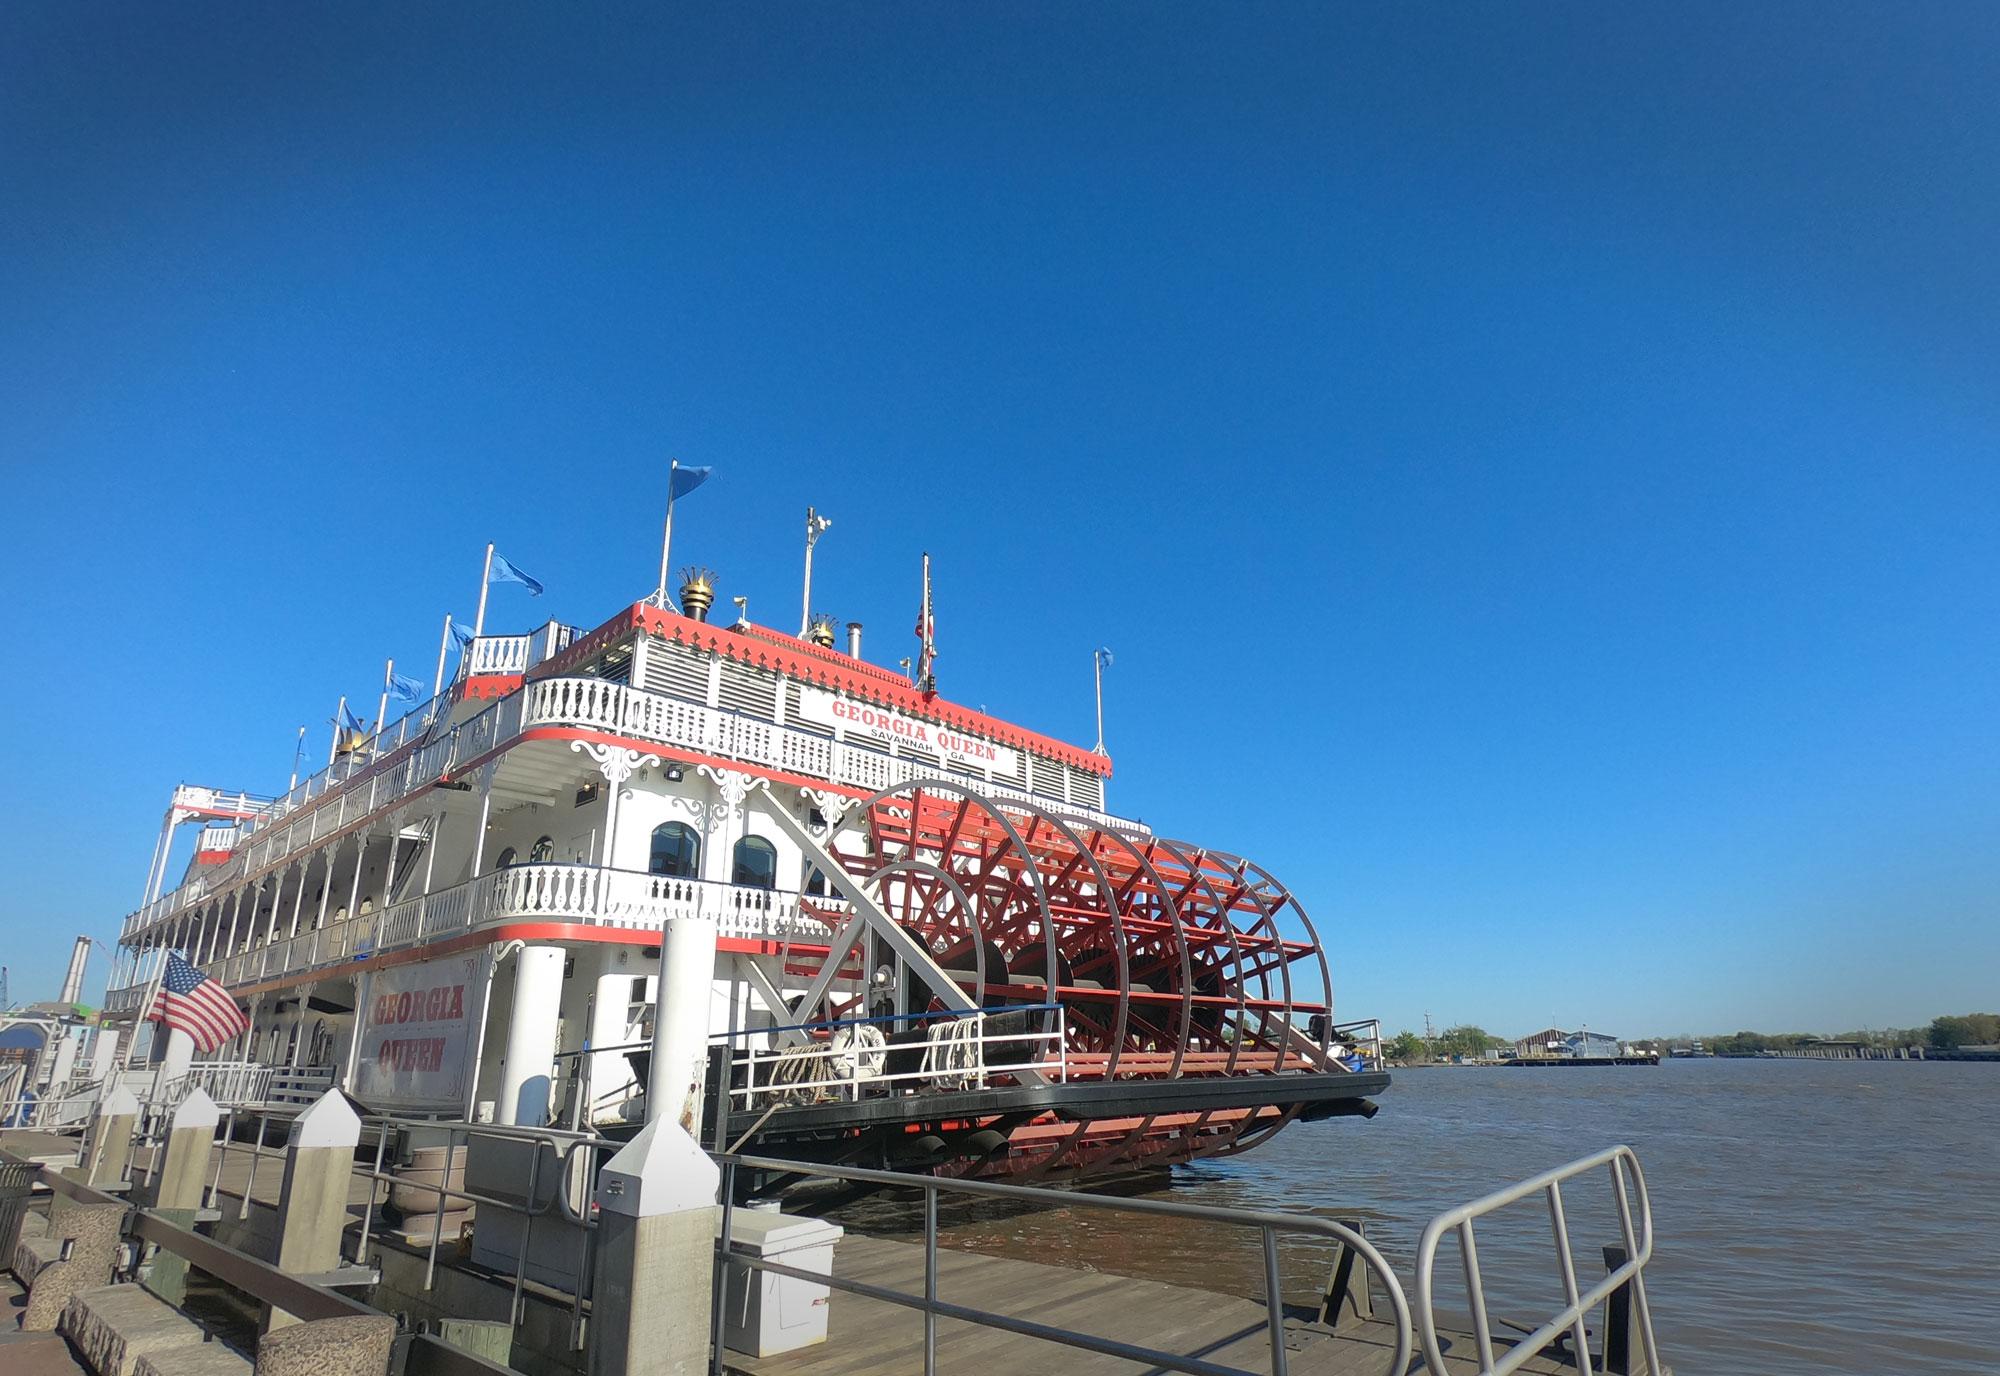 Georgia Queen riverboat on the Savannah, Georgia, riverfront